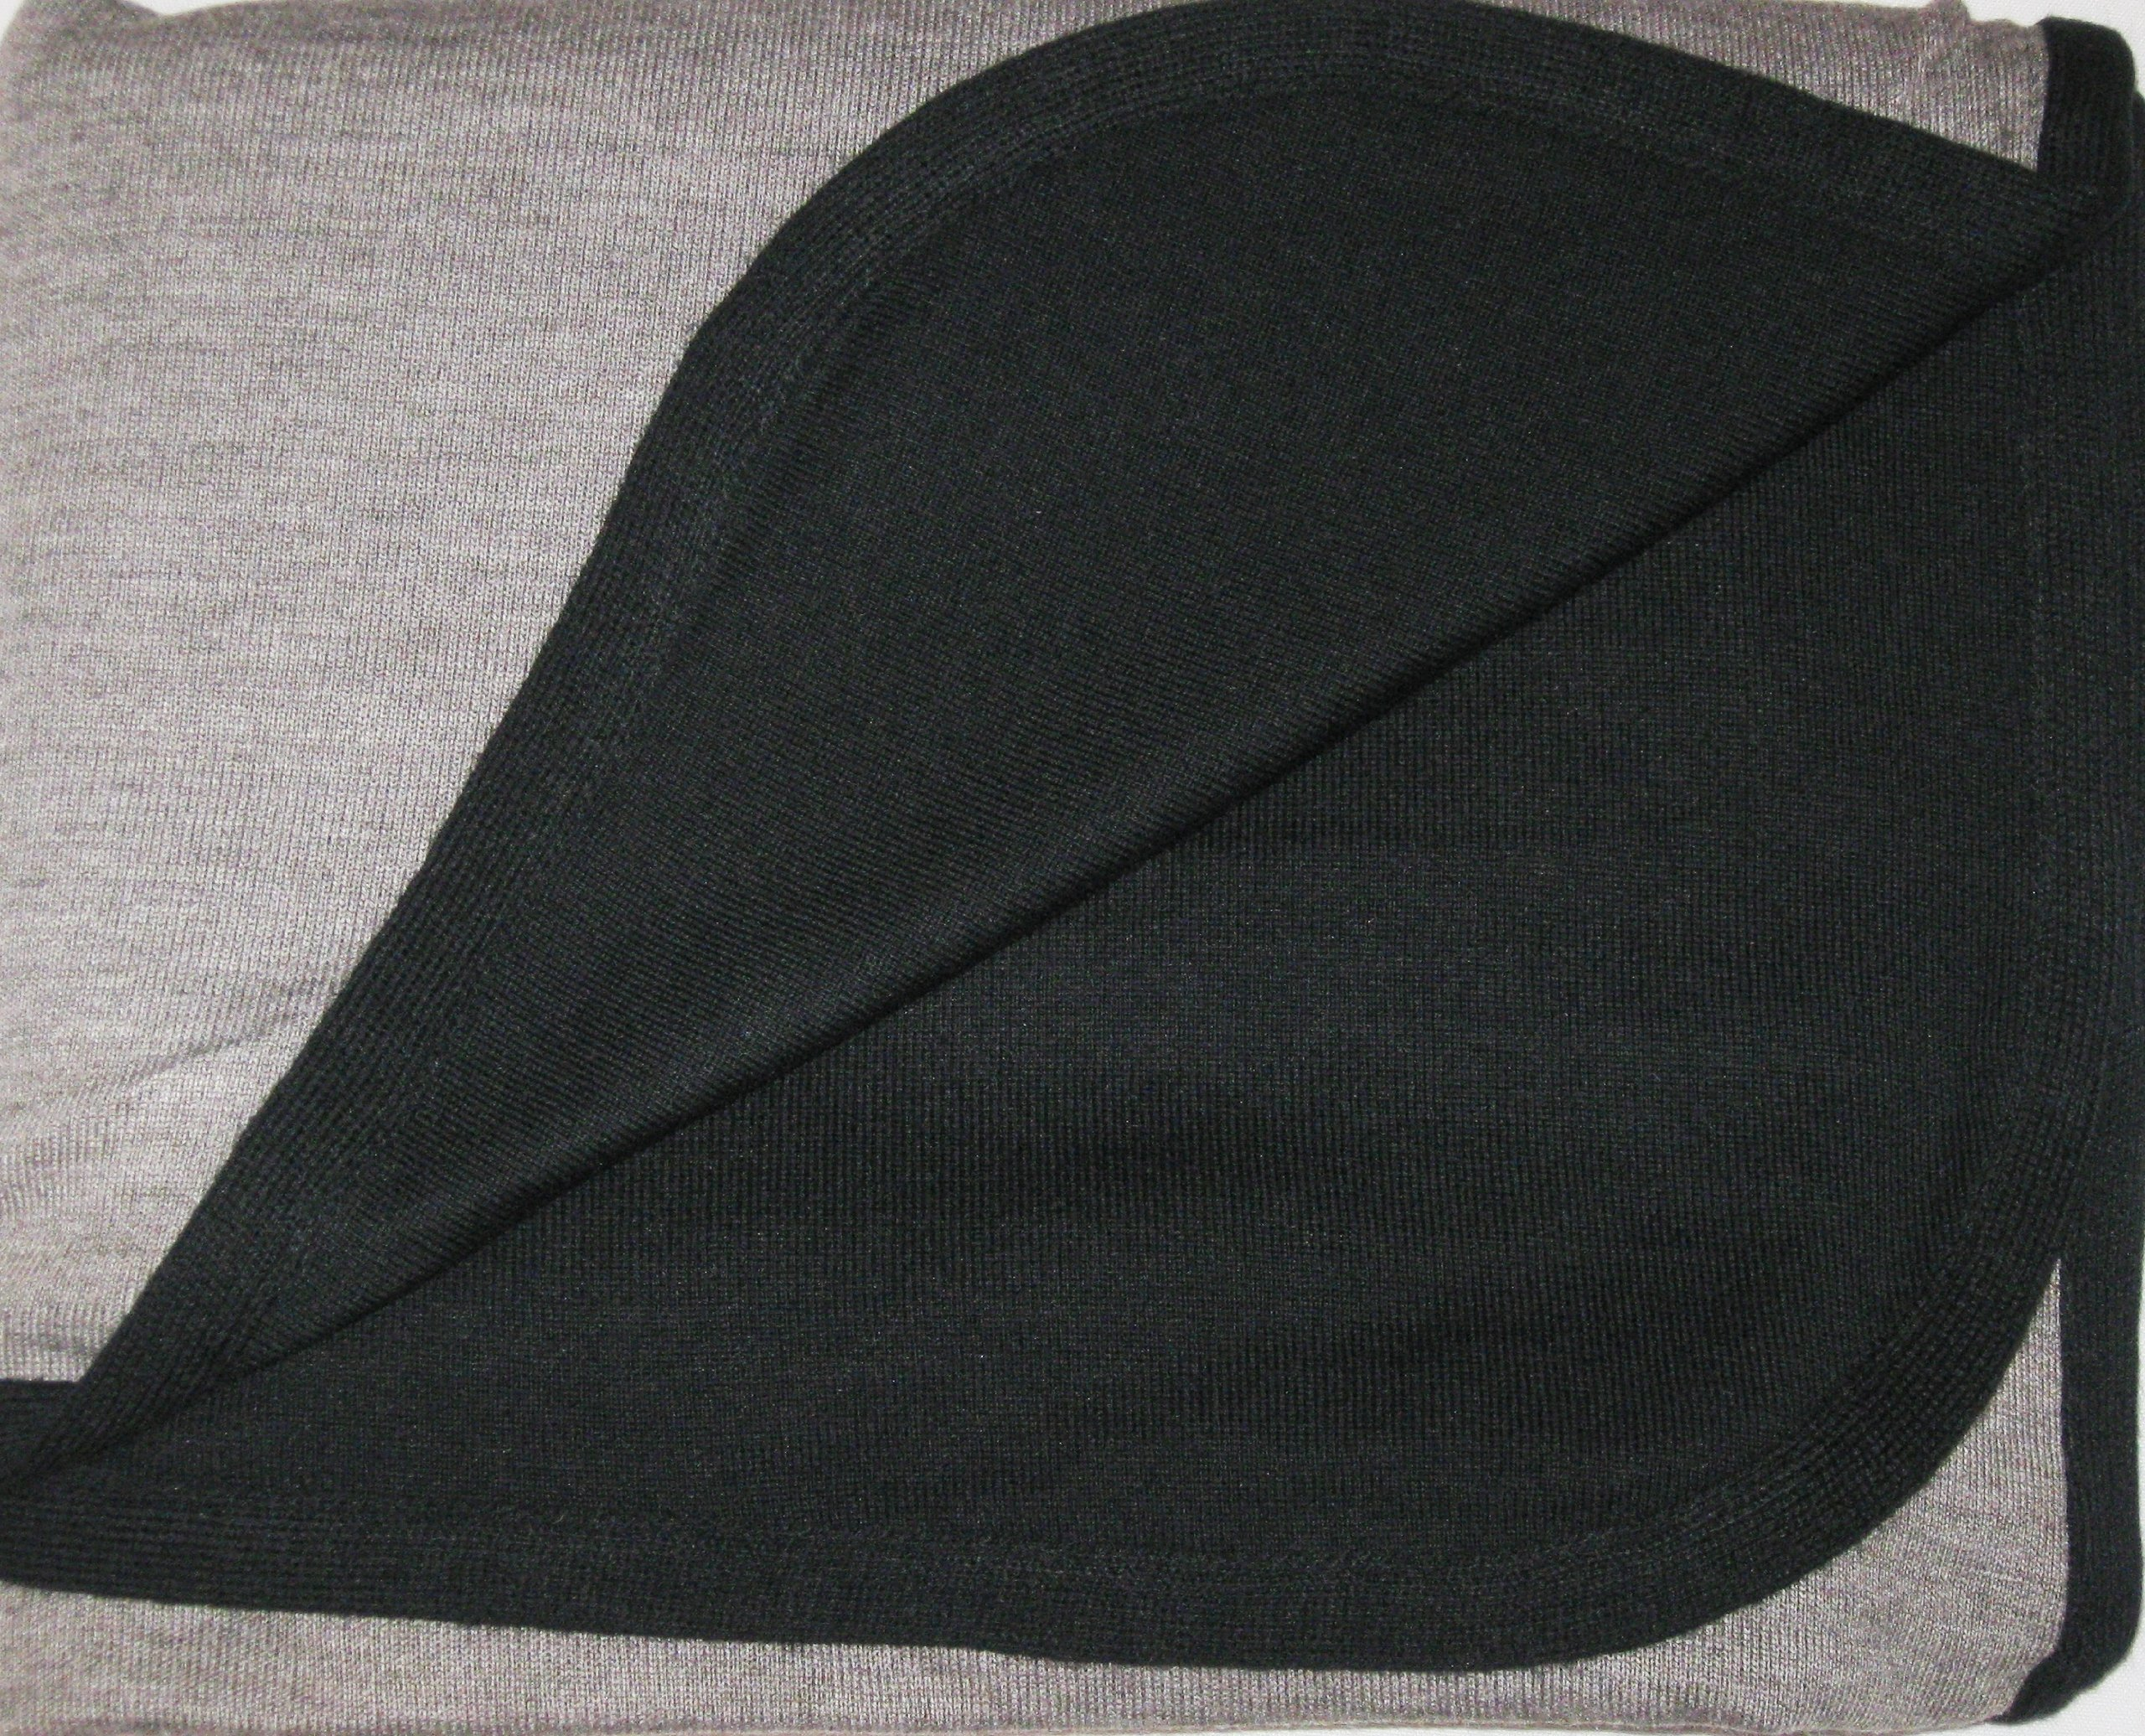 Cashmere Pashmina Group- Cape Woolen Reversible Ruana Knitted Poncho Shawl Cardigans Sweater Coat (Black/ Stone) by Cashmere Pashmina Group (Image #2)